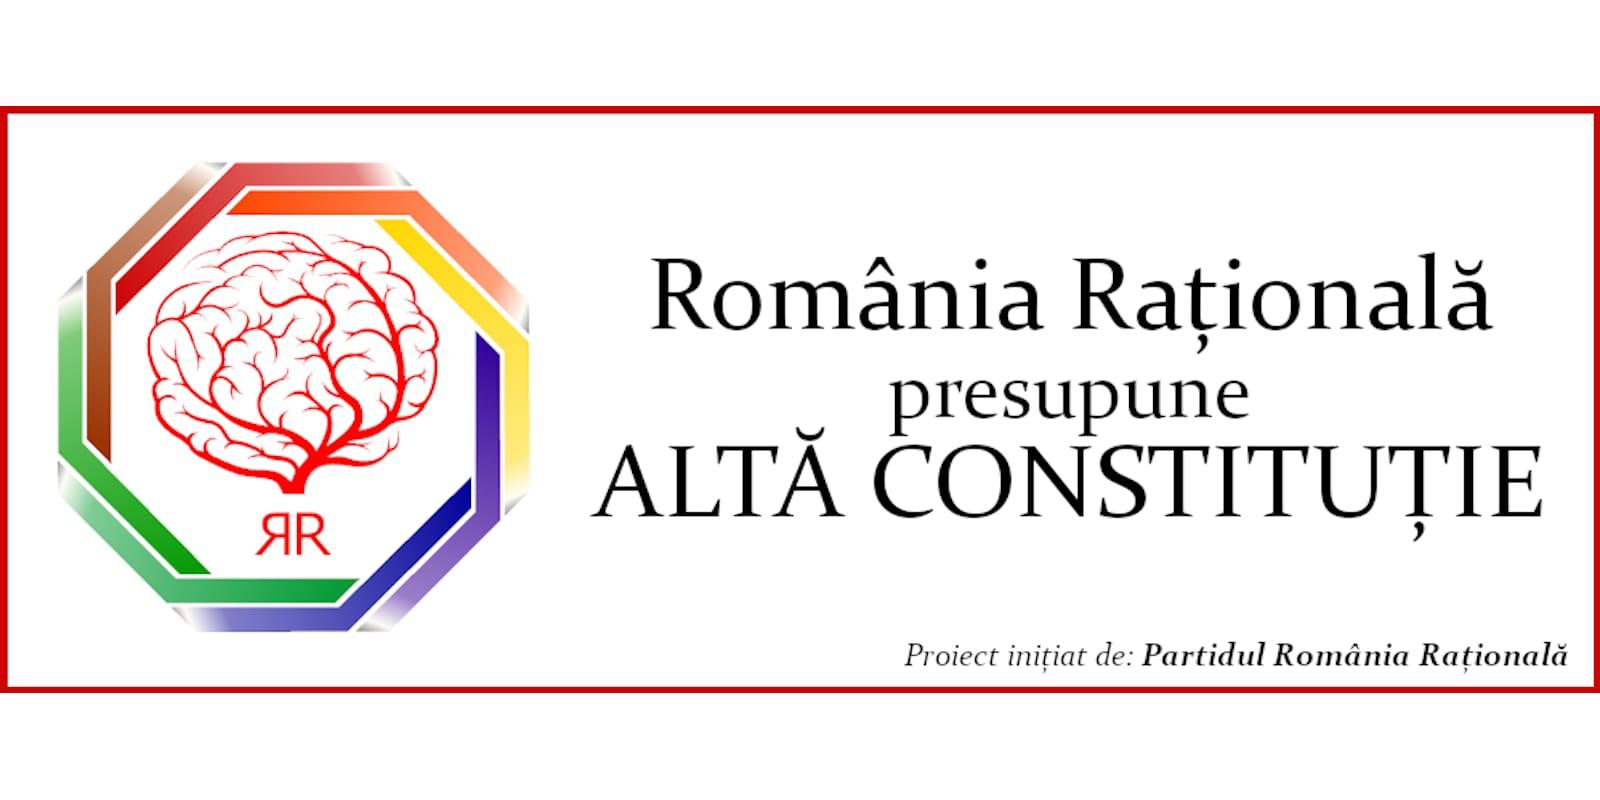 https://ziarul.romania-rationala.ro/control/articole/articole/vreau-o-alta-constitutie.jpg